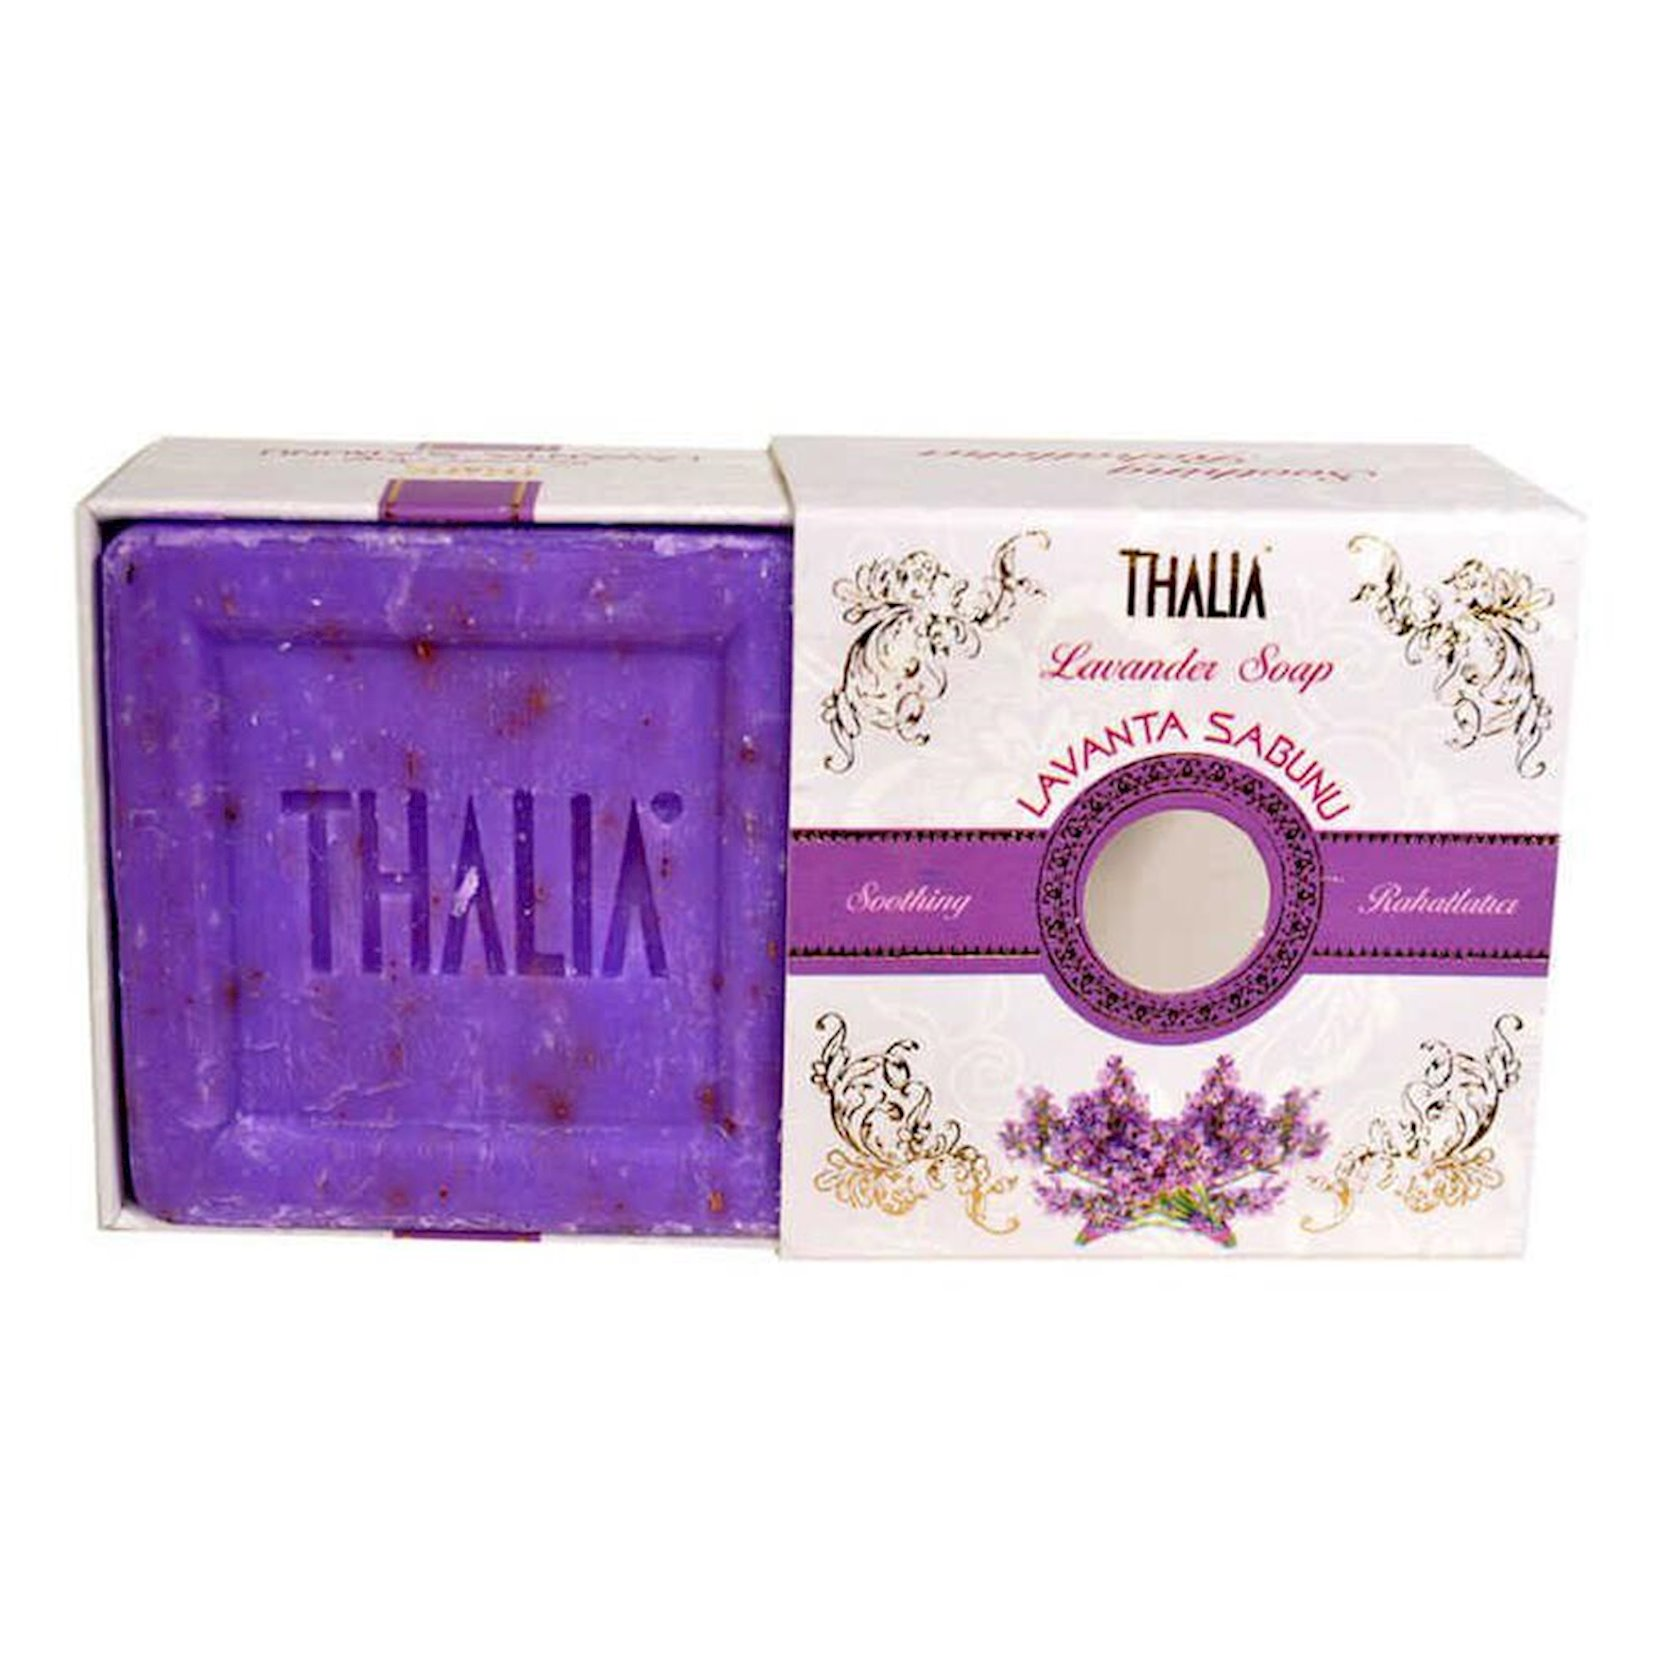 Natural sabun Thalia Relaxing Lavender 150 qr